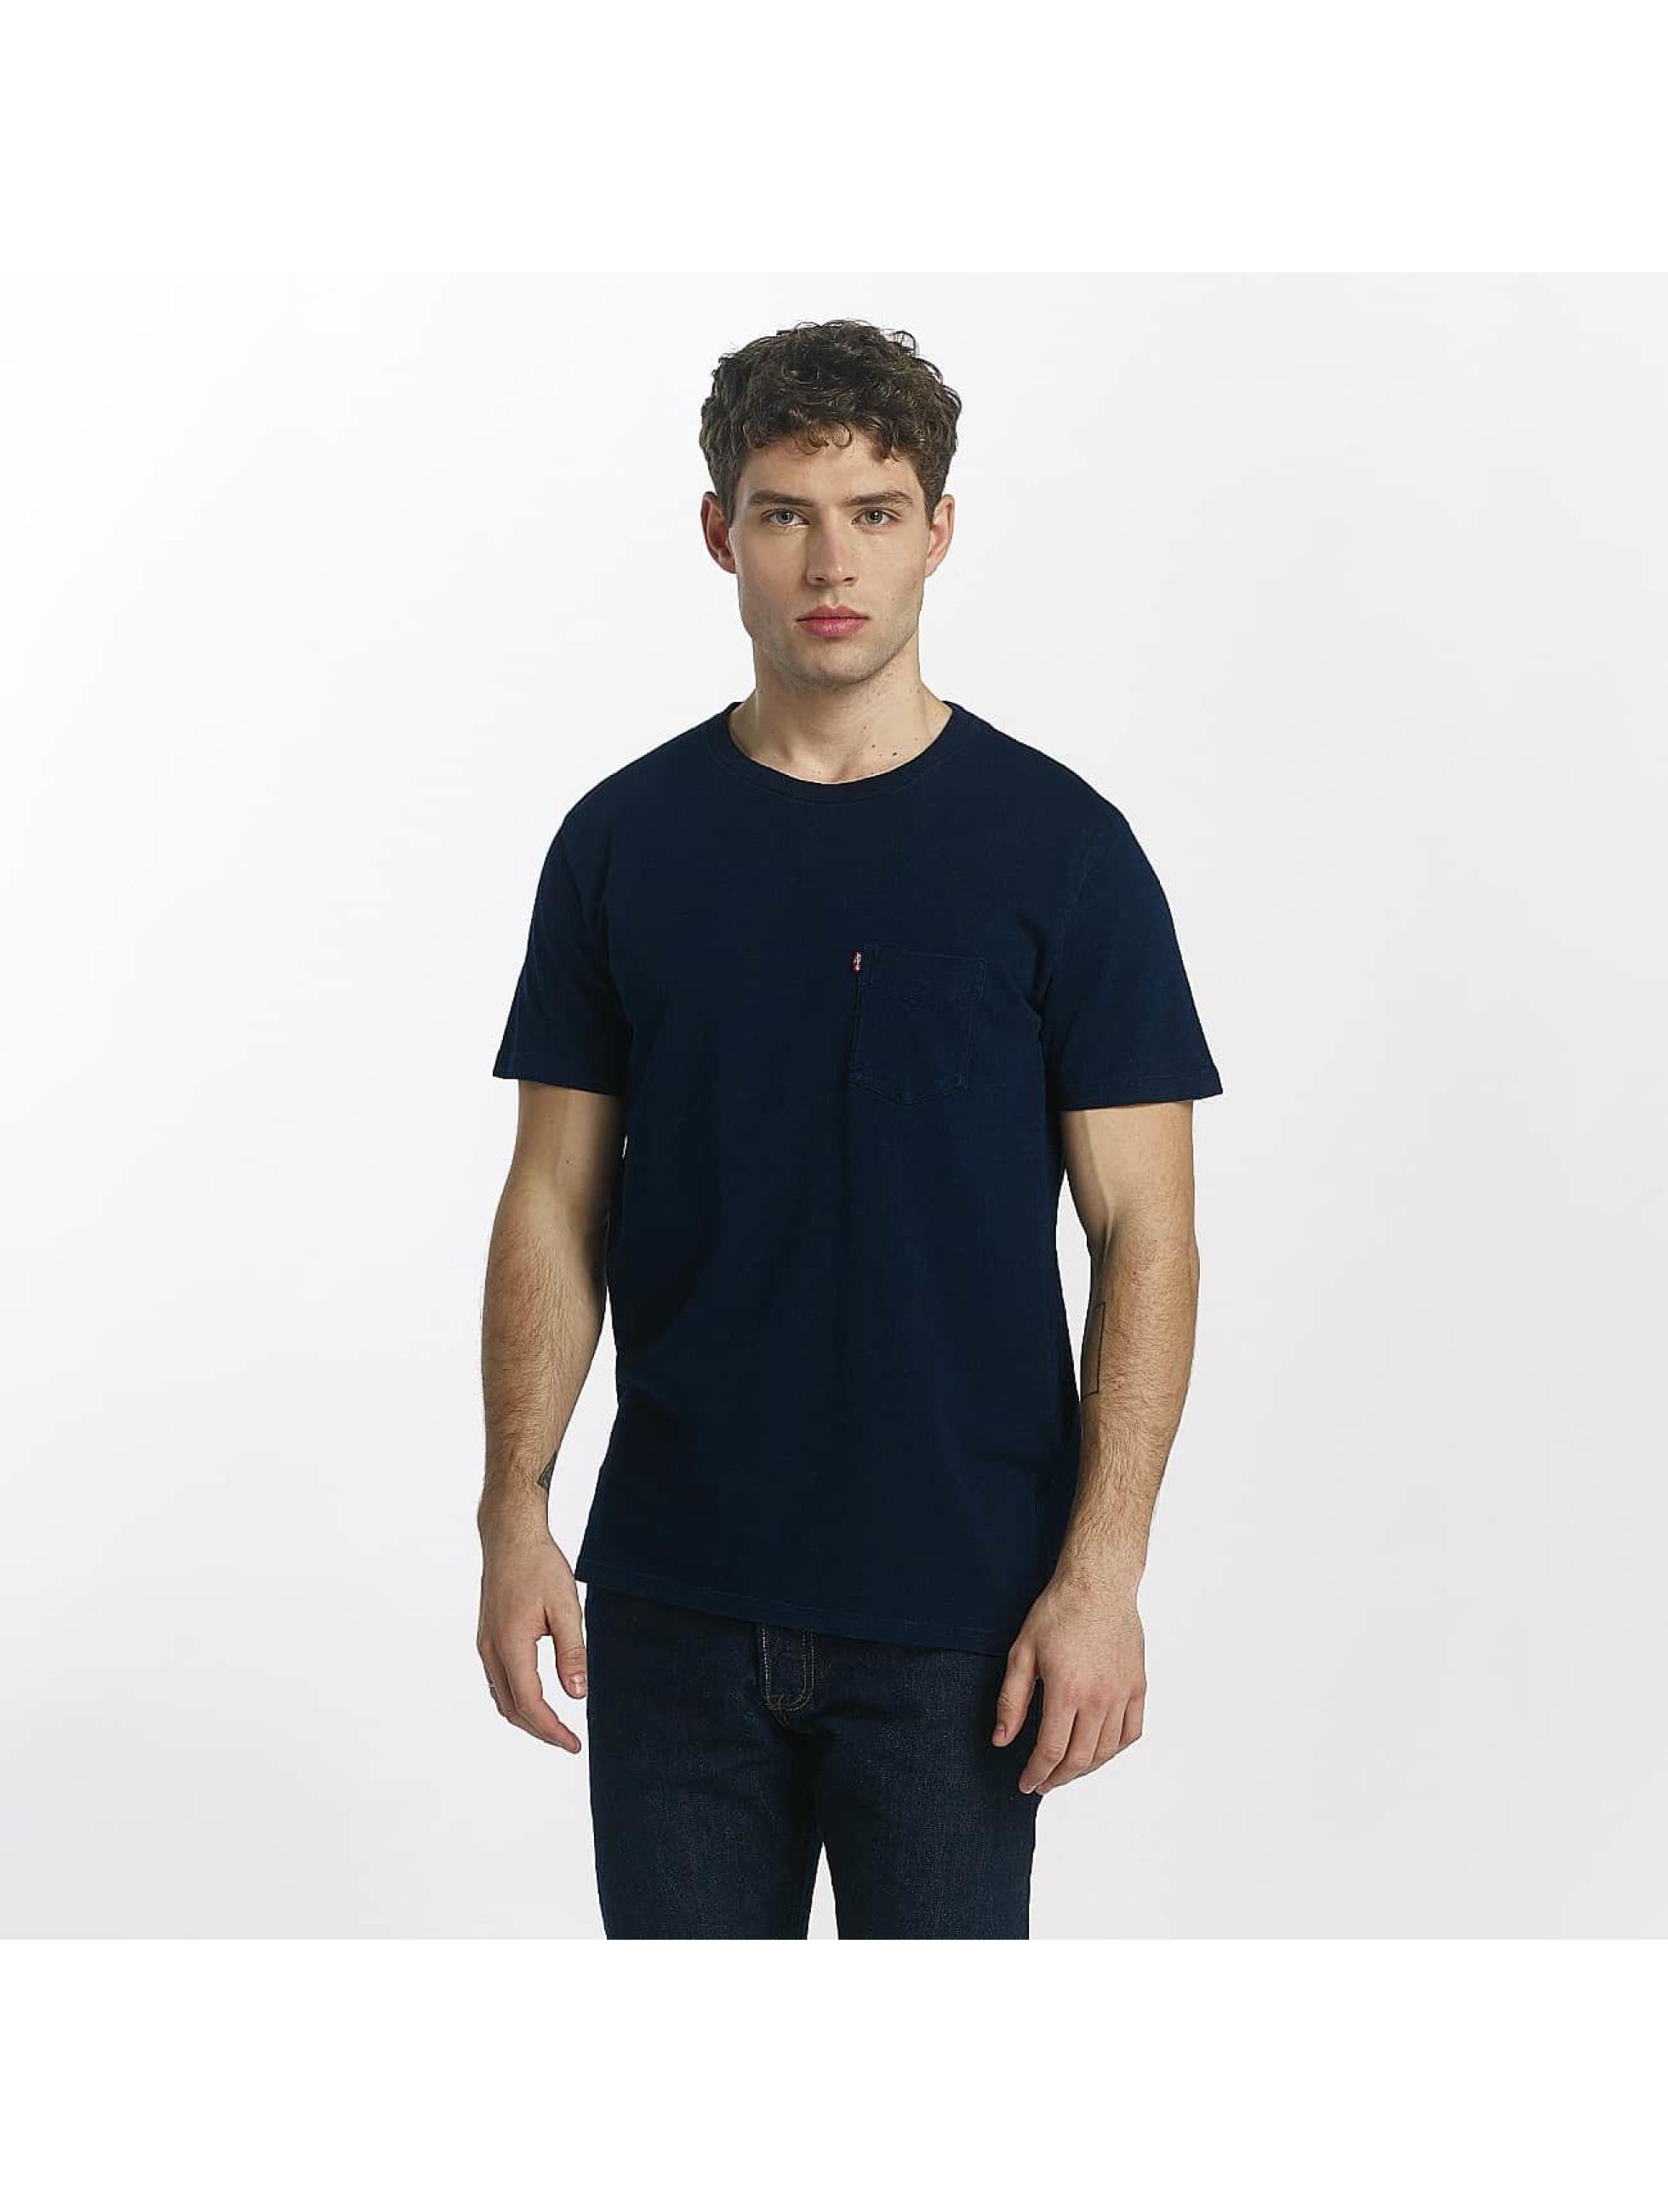 levi 39 s set in sunset pocket indigo homme t shirt levi 39 s acheter pas cher haut 438008. Black Bedroom Furniture Sets. Home Design Ideas